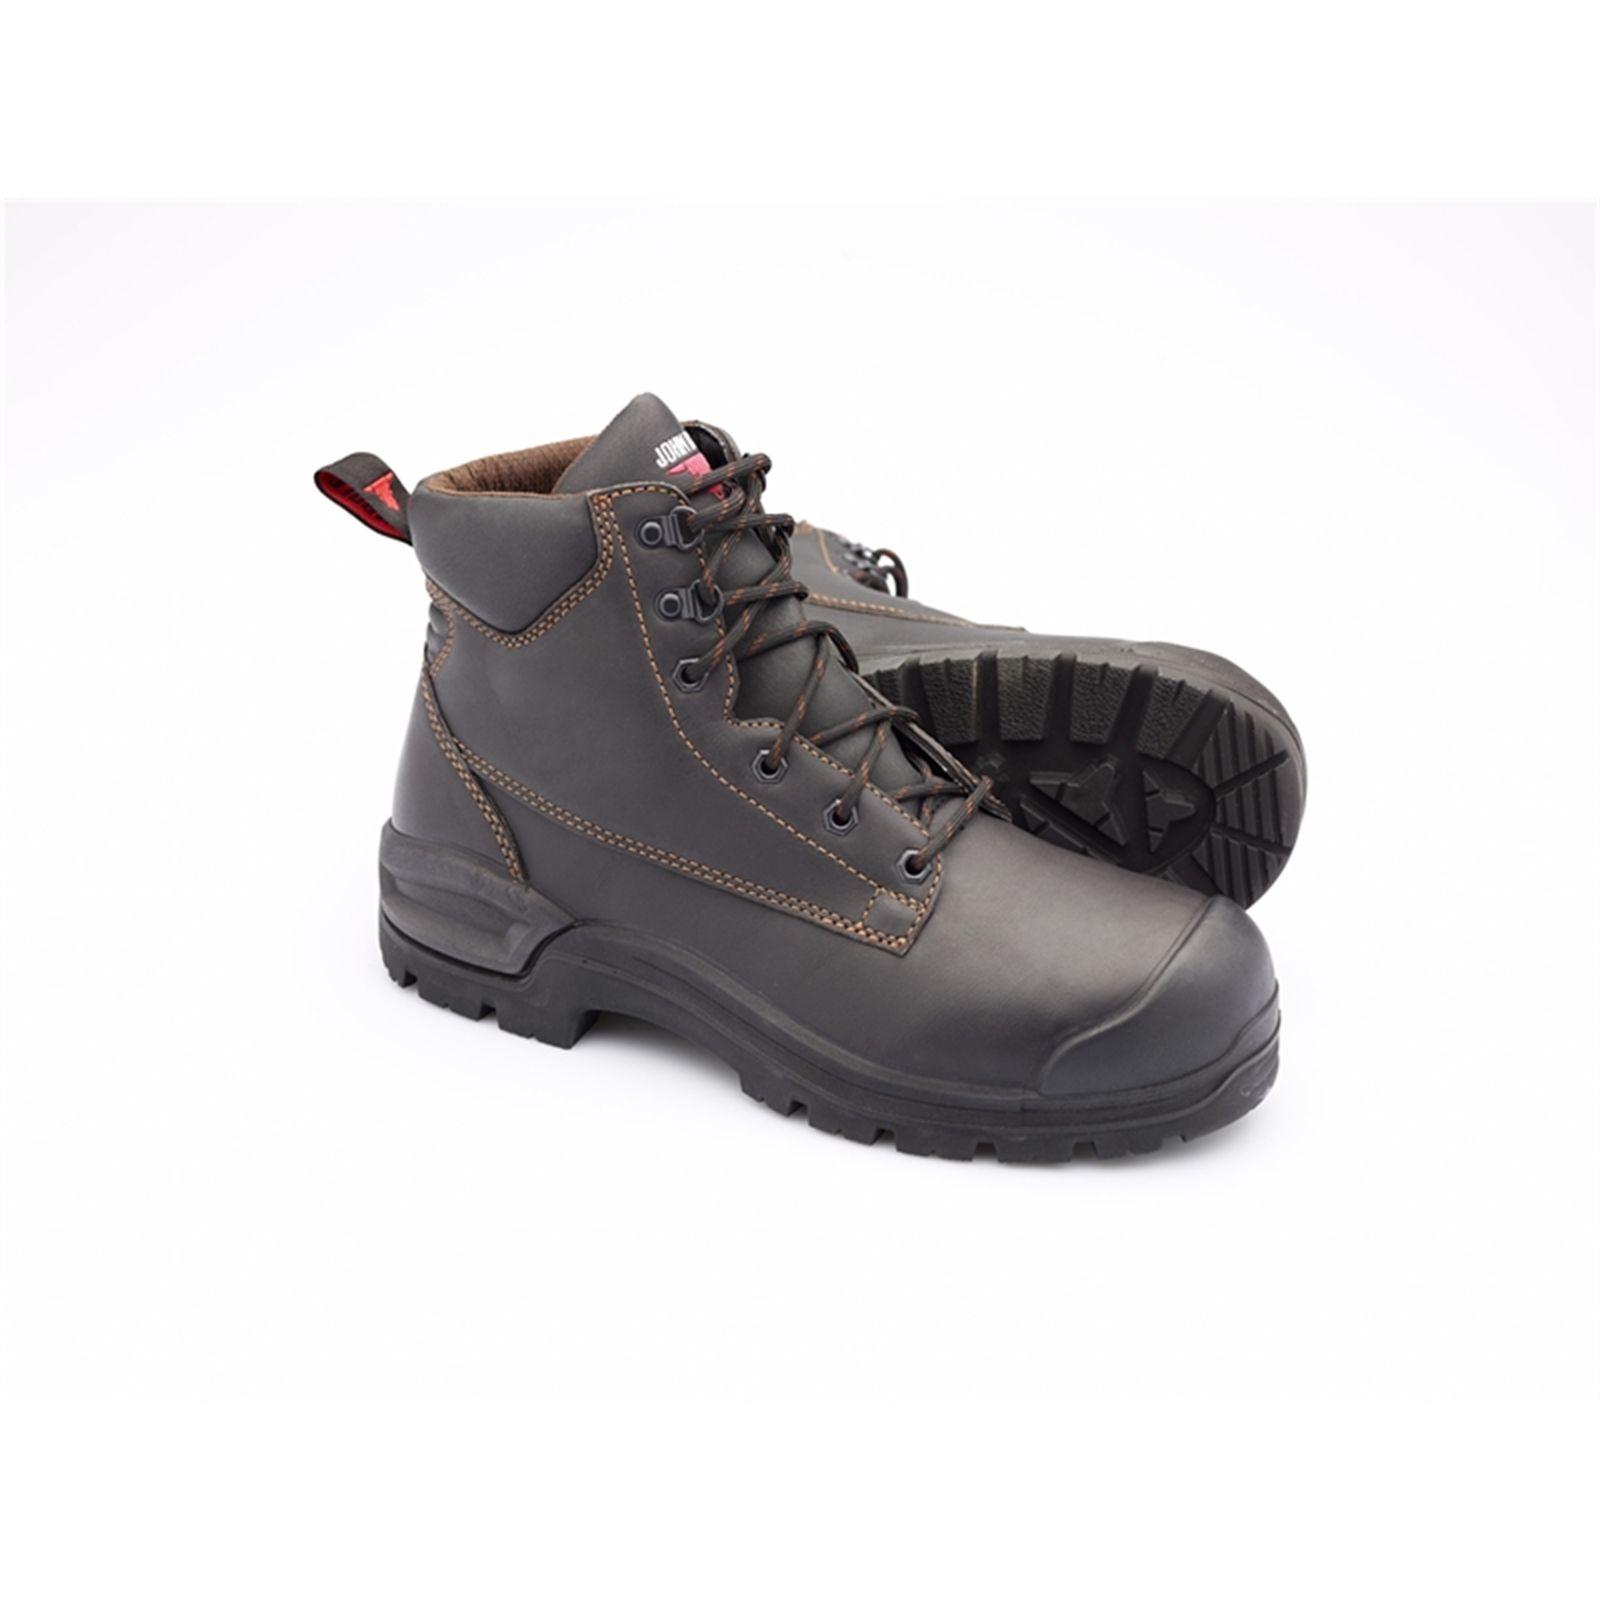 7b164232b7b John Bull Himalaya Safety Boot Size 7 Brown   Bunnings Warehouse ...